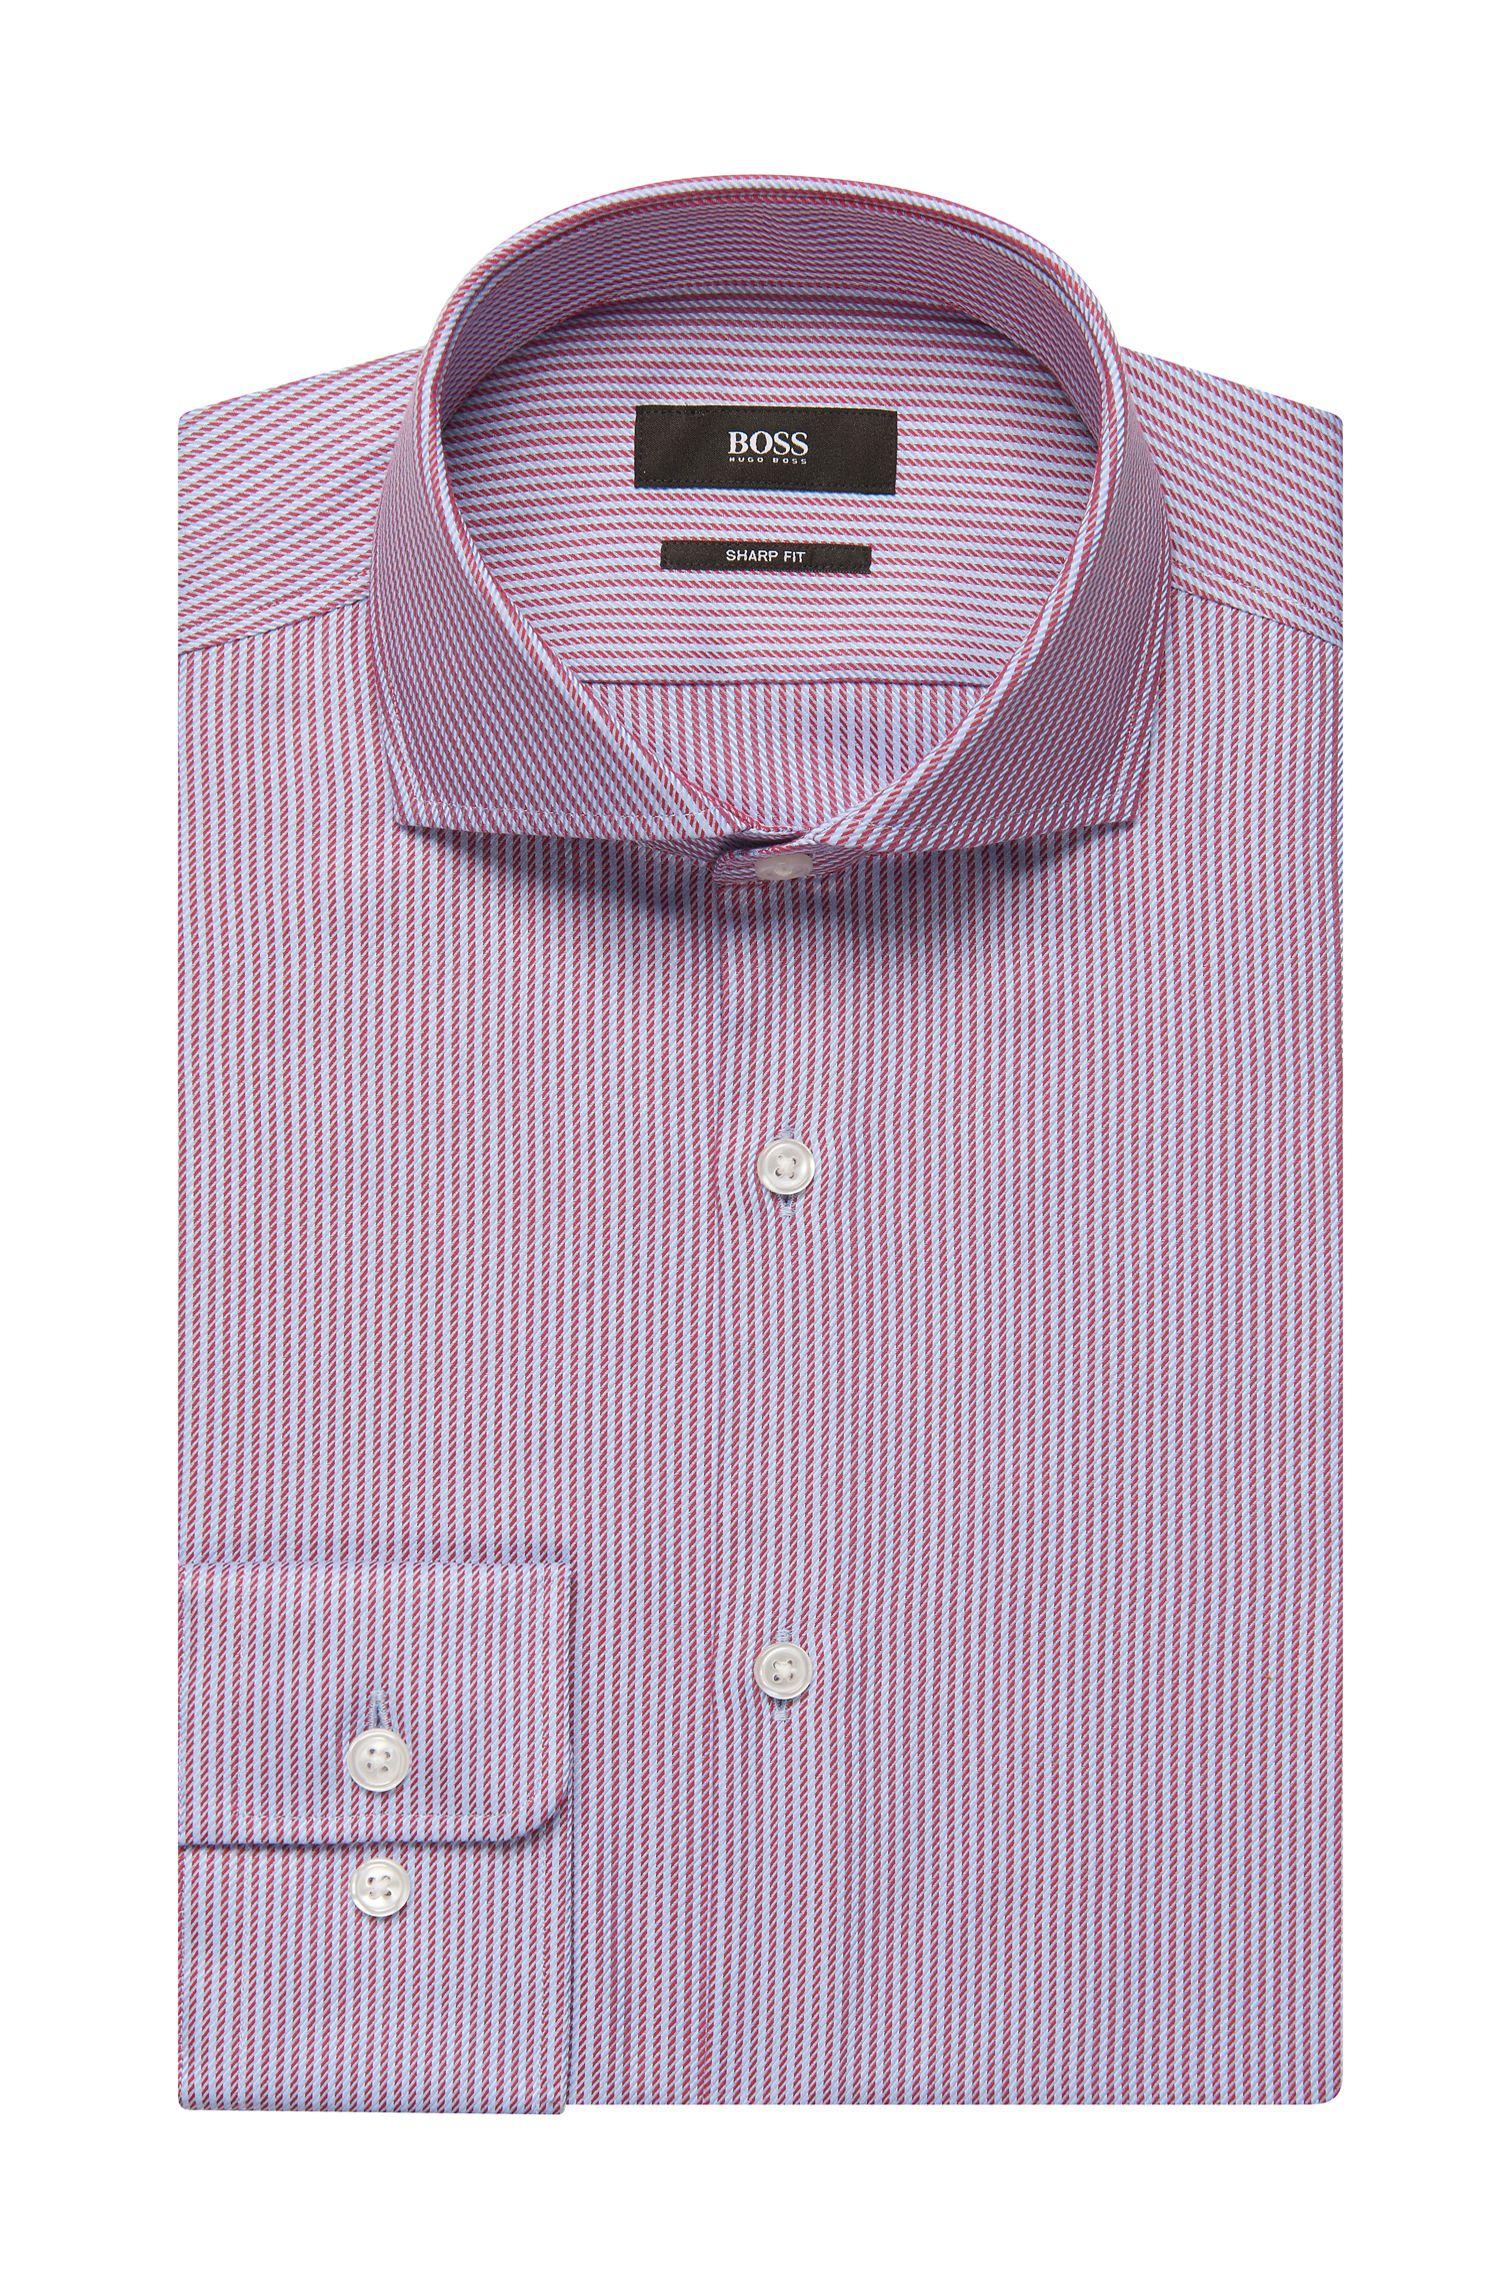 Striped Cotton Dress Shirt, Sharp Fit | Mark US